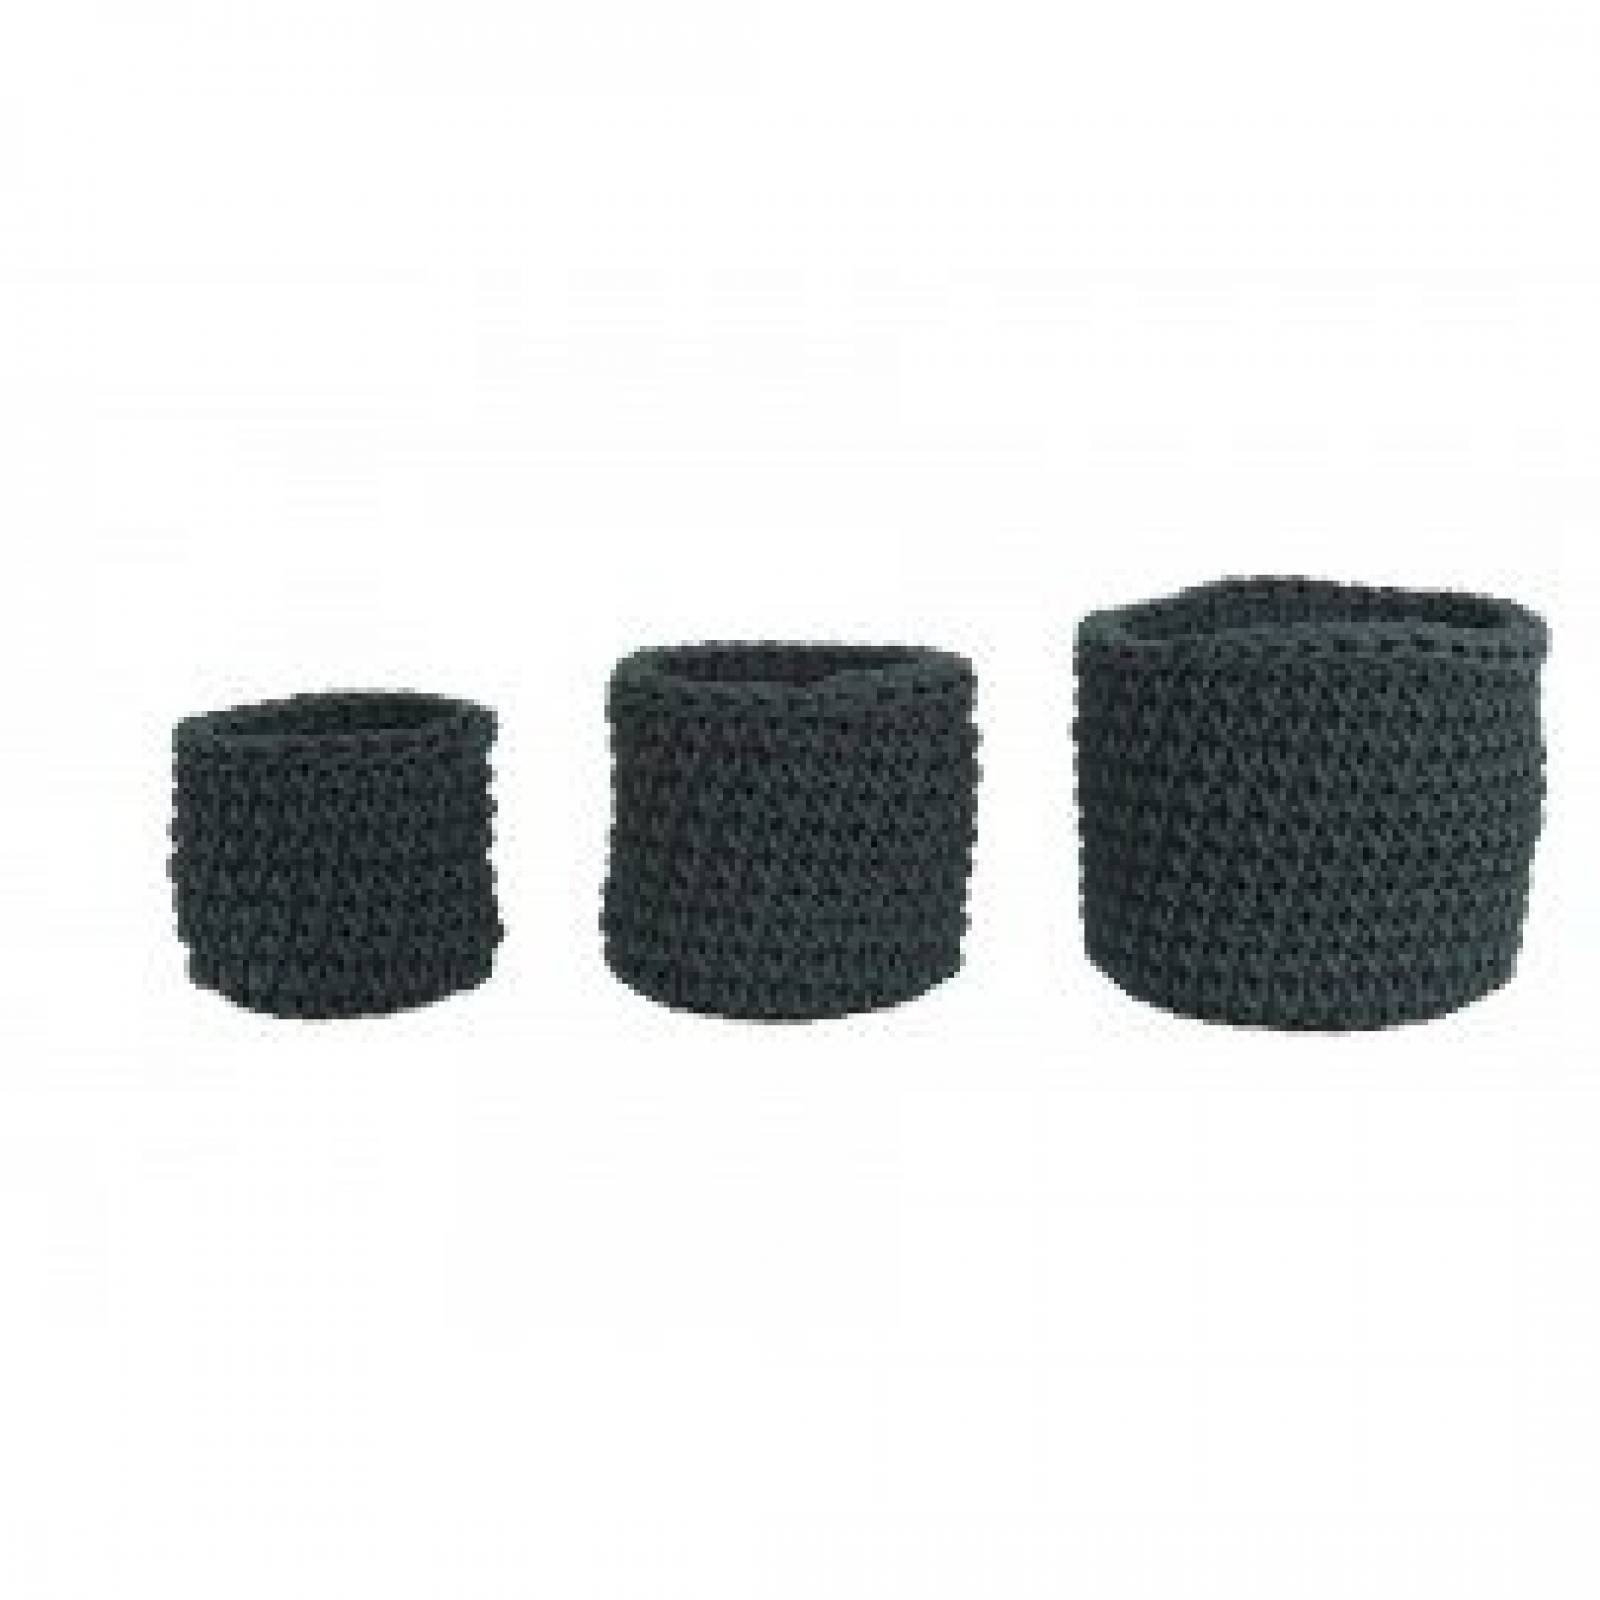 Abari Green Woven Basket Medium